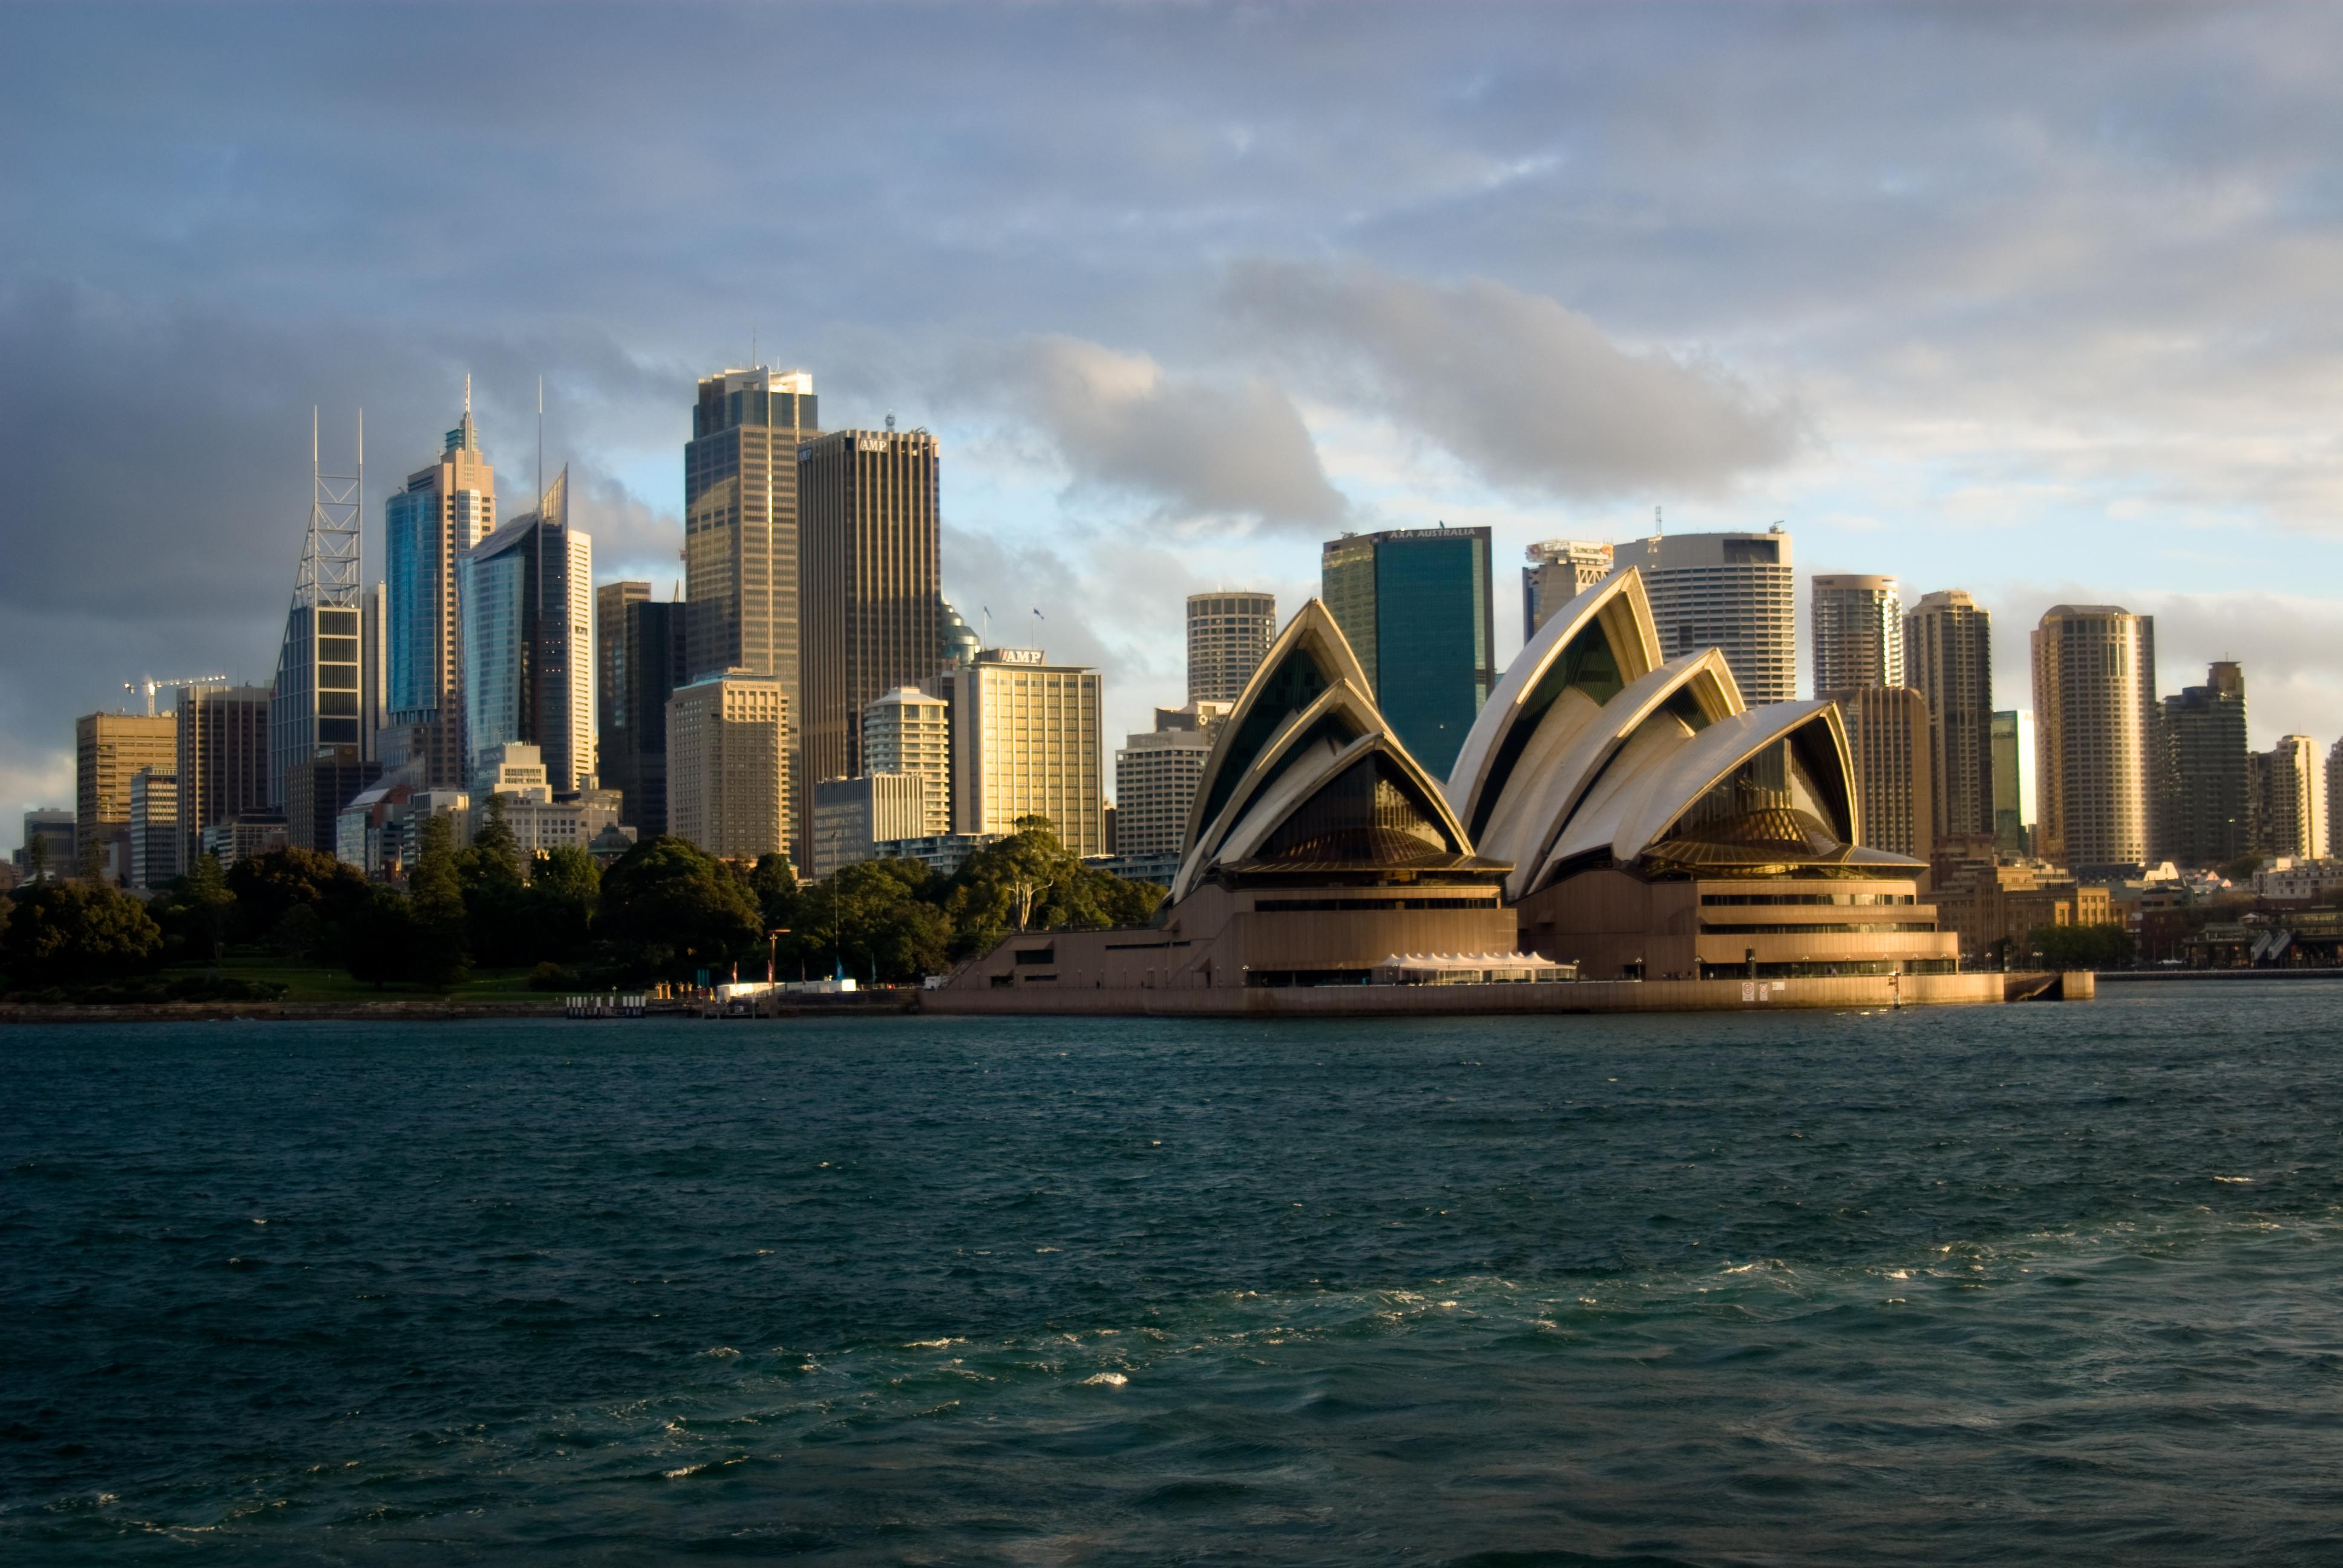 http://upload.wikimedia.org/wikipedia/commons/2/27/Sydney_Opera_House_with_city.jpg